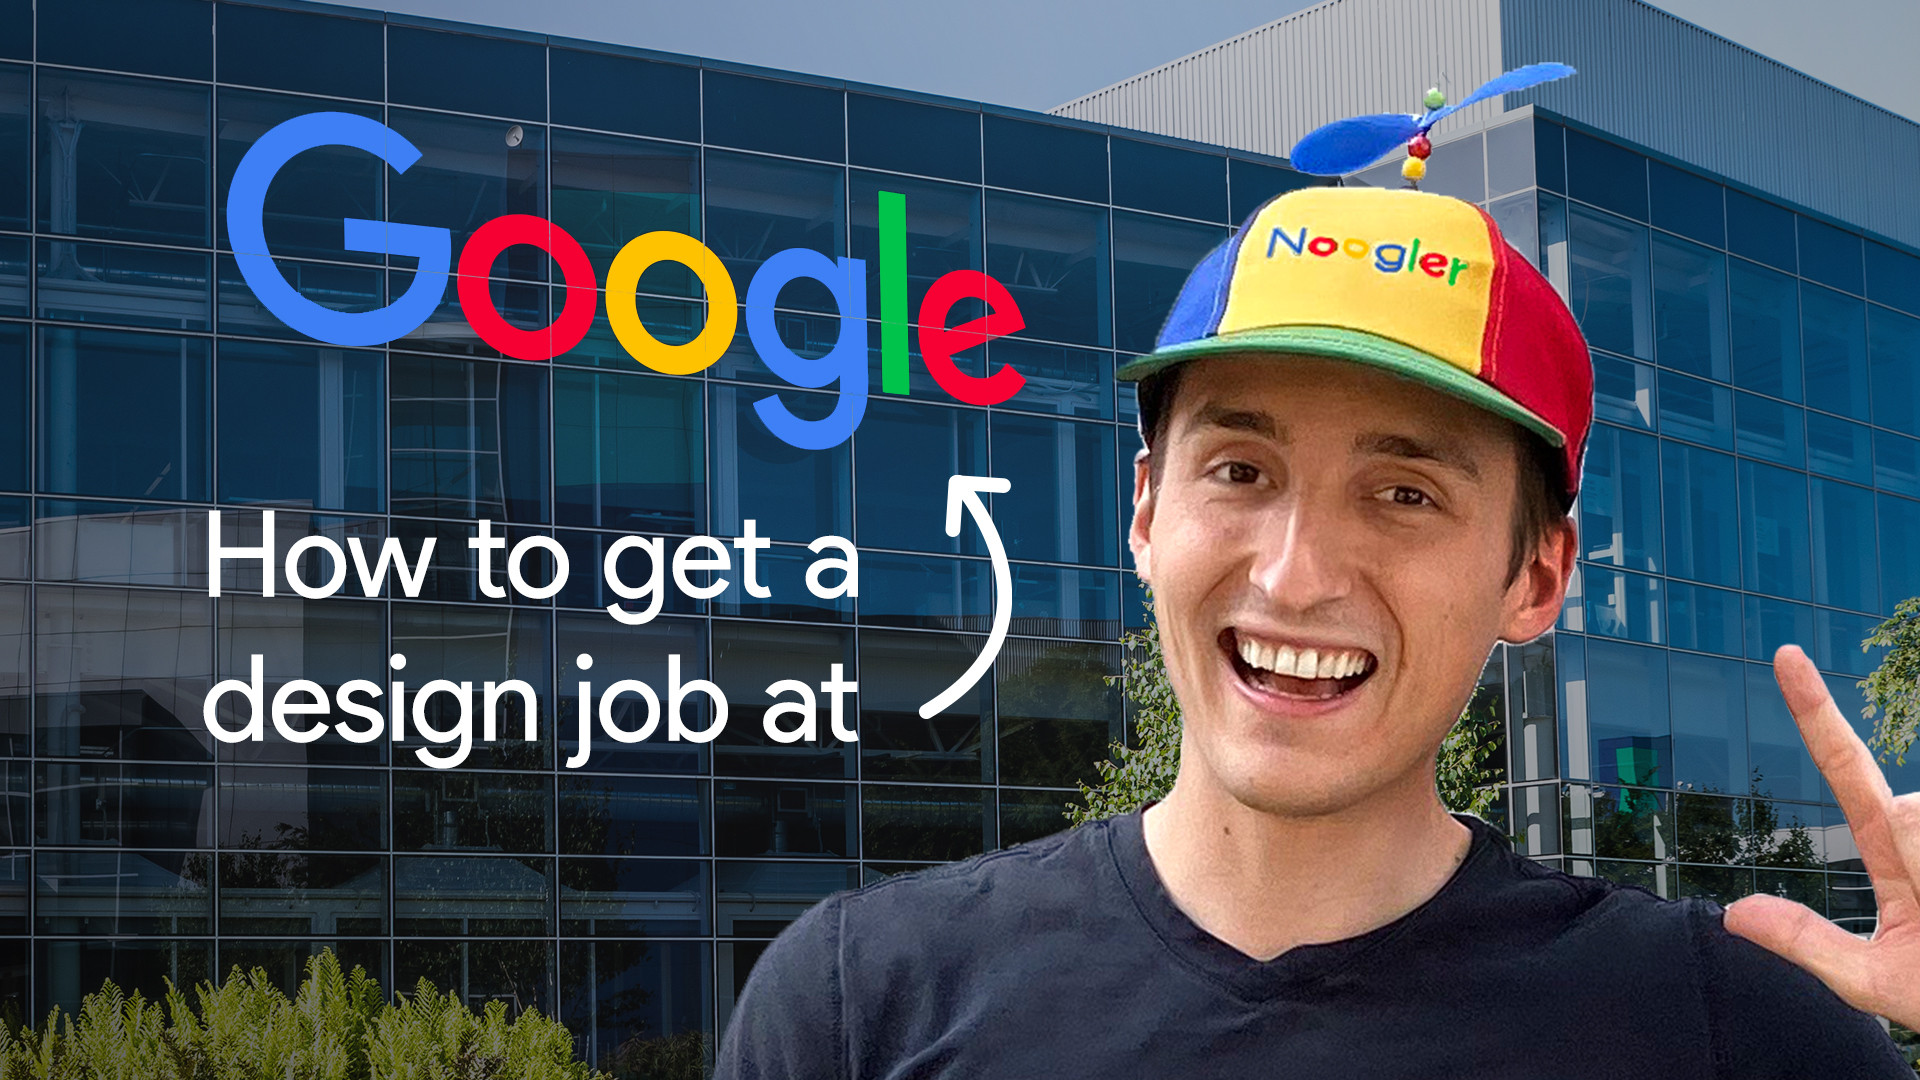 How to get a design job at Google